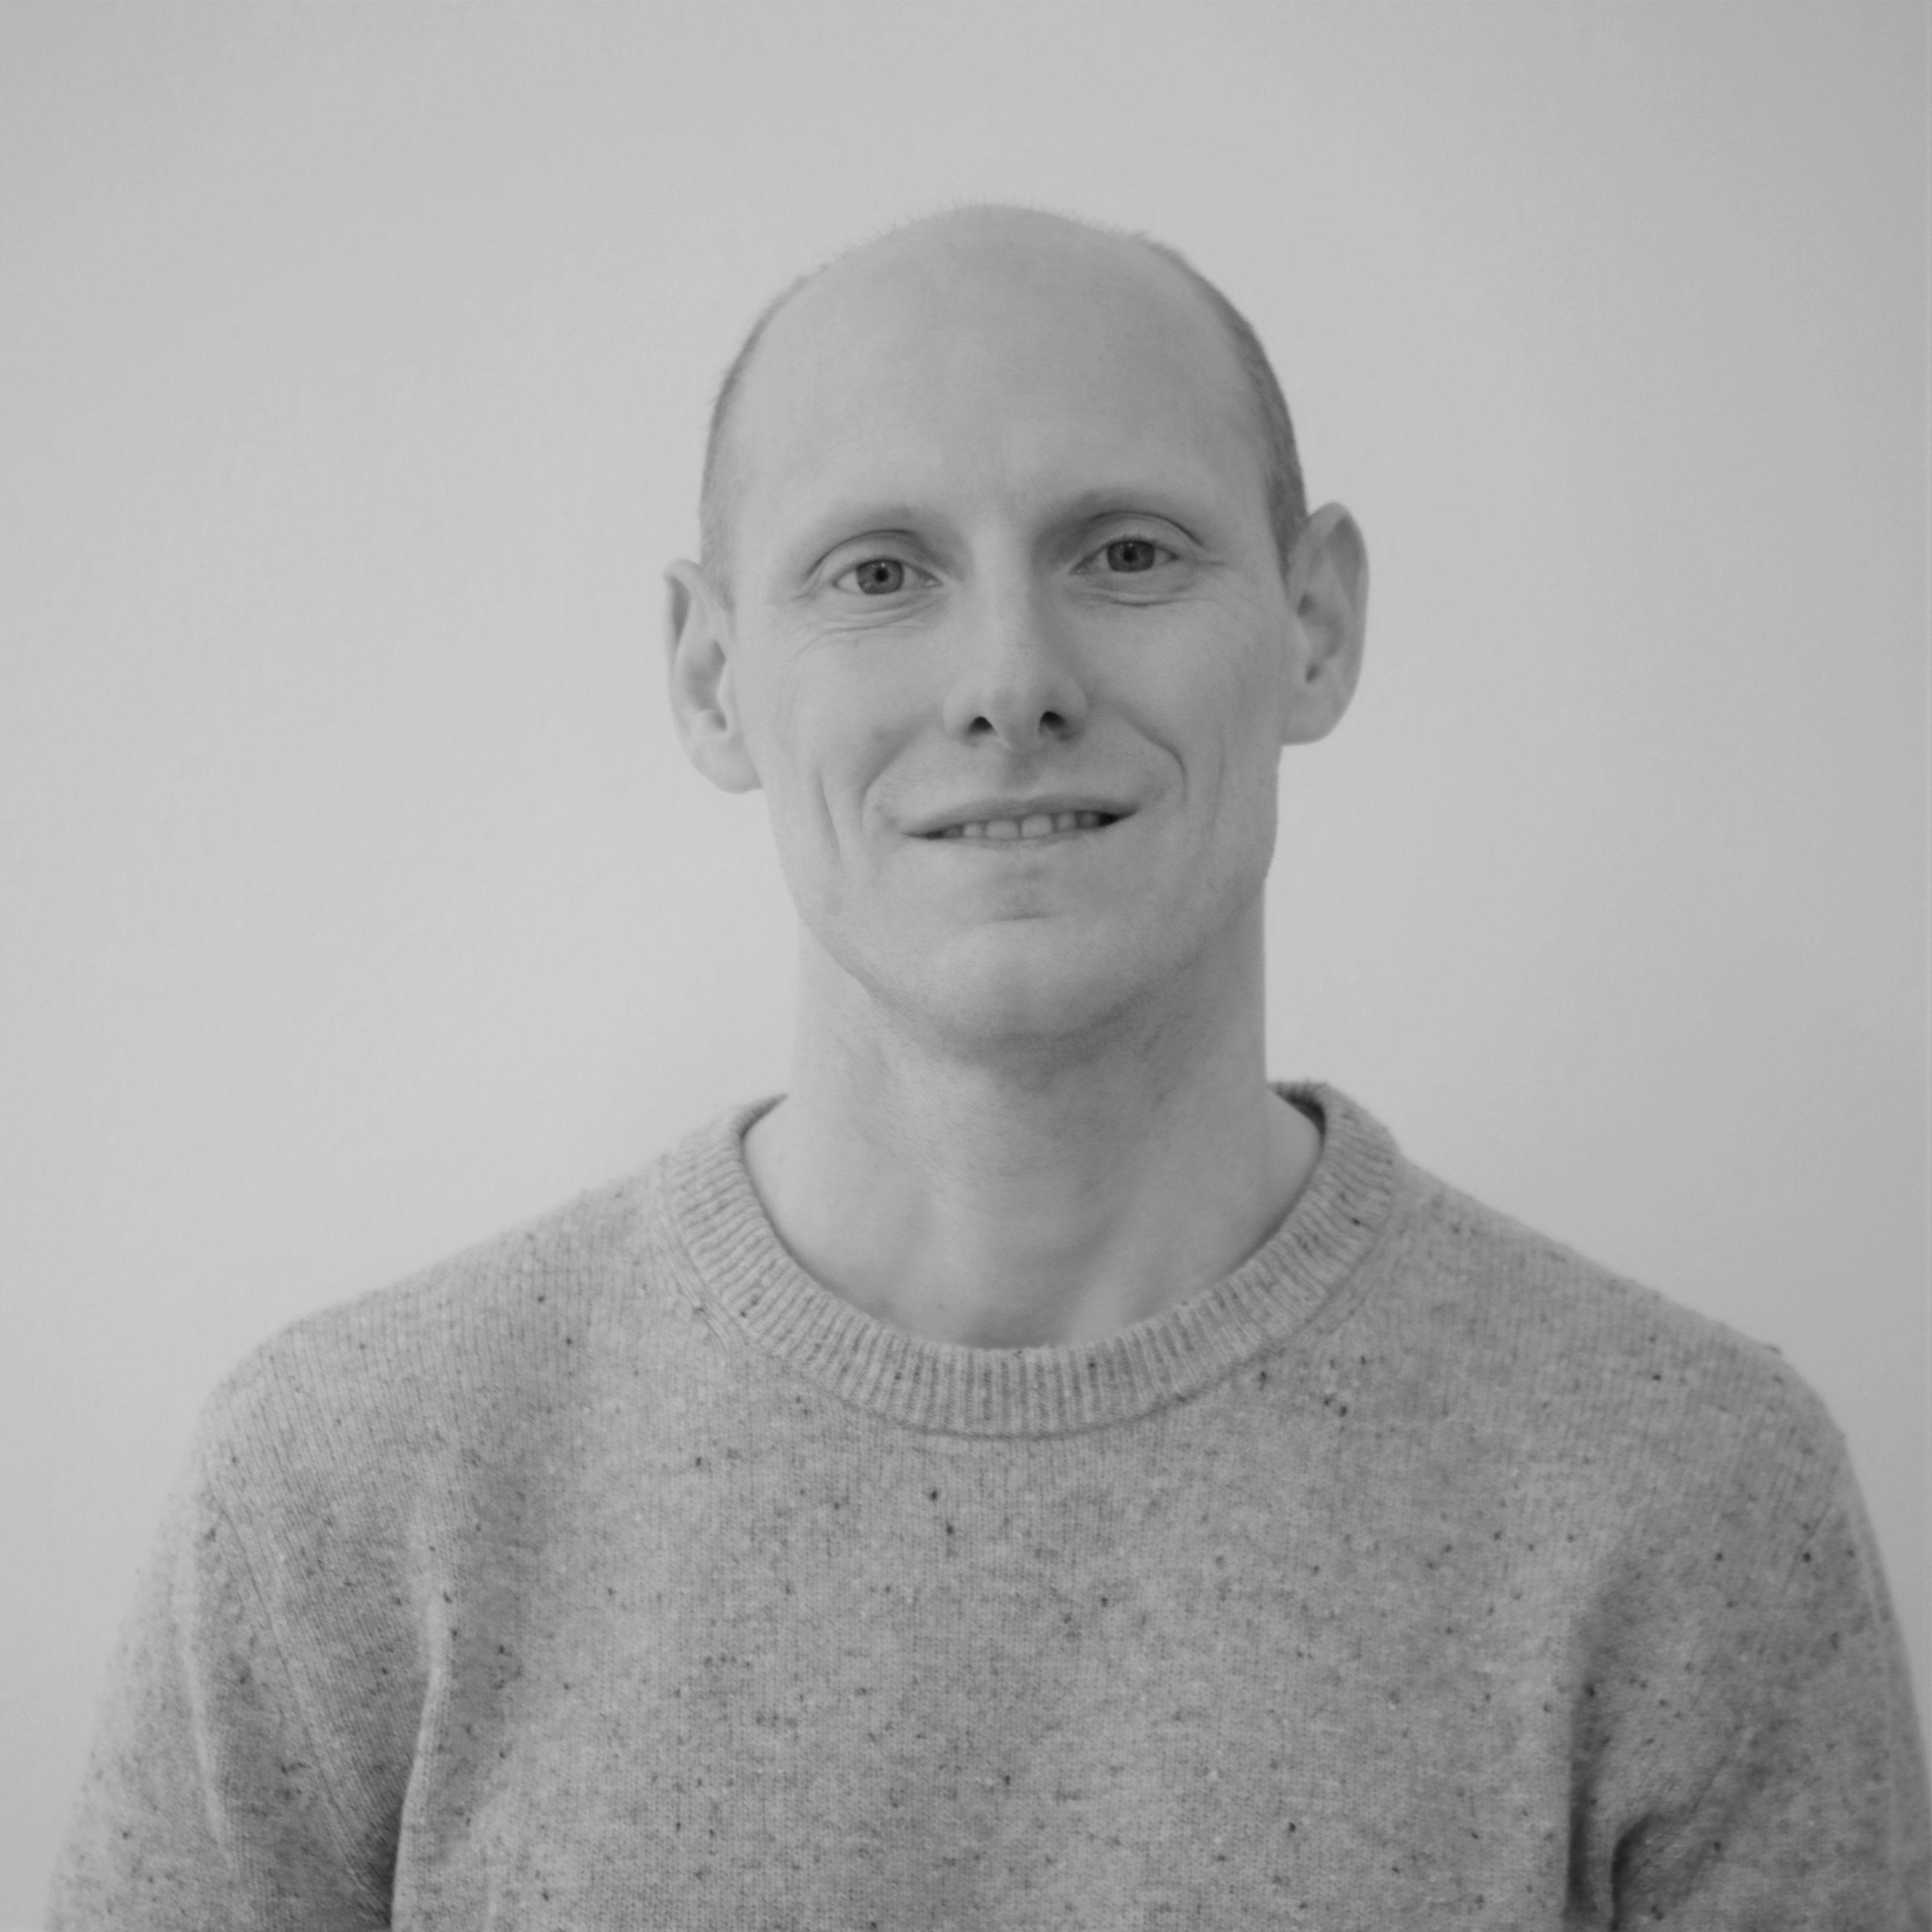 Dr. Johan Hallström